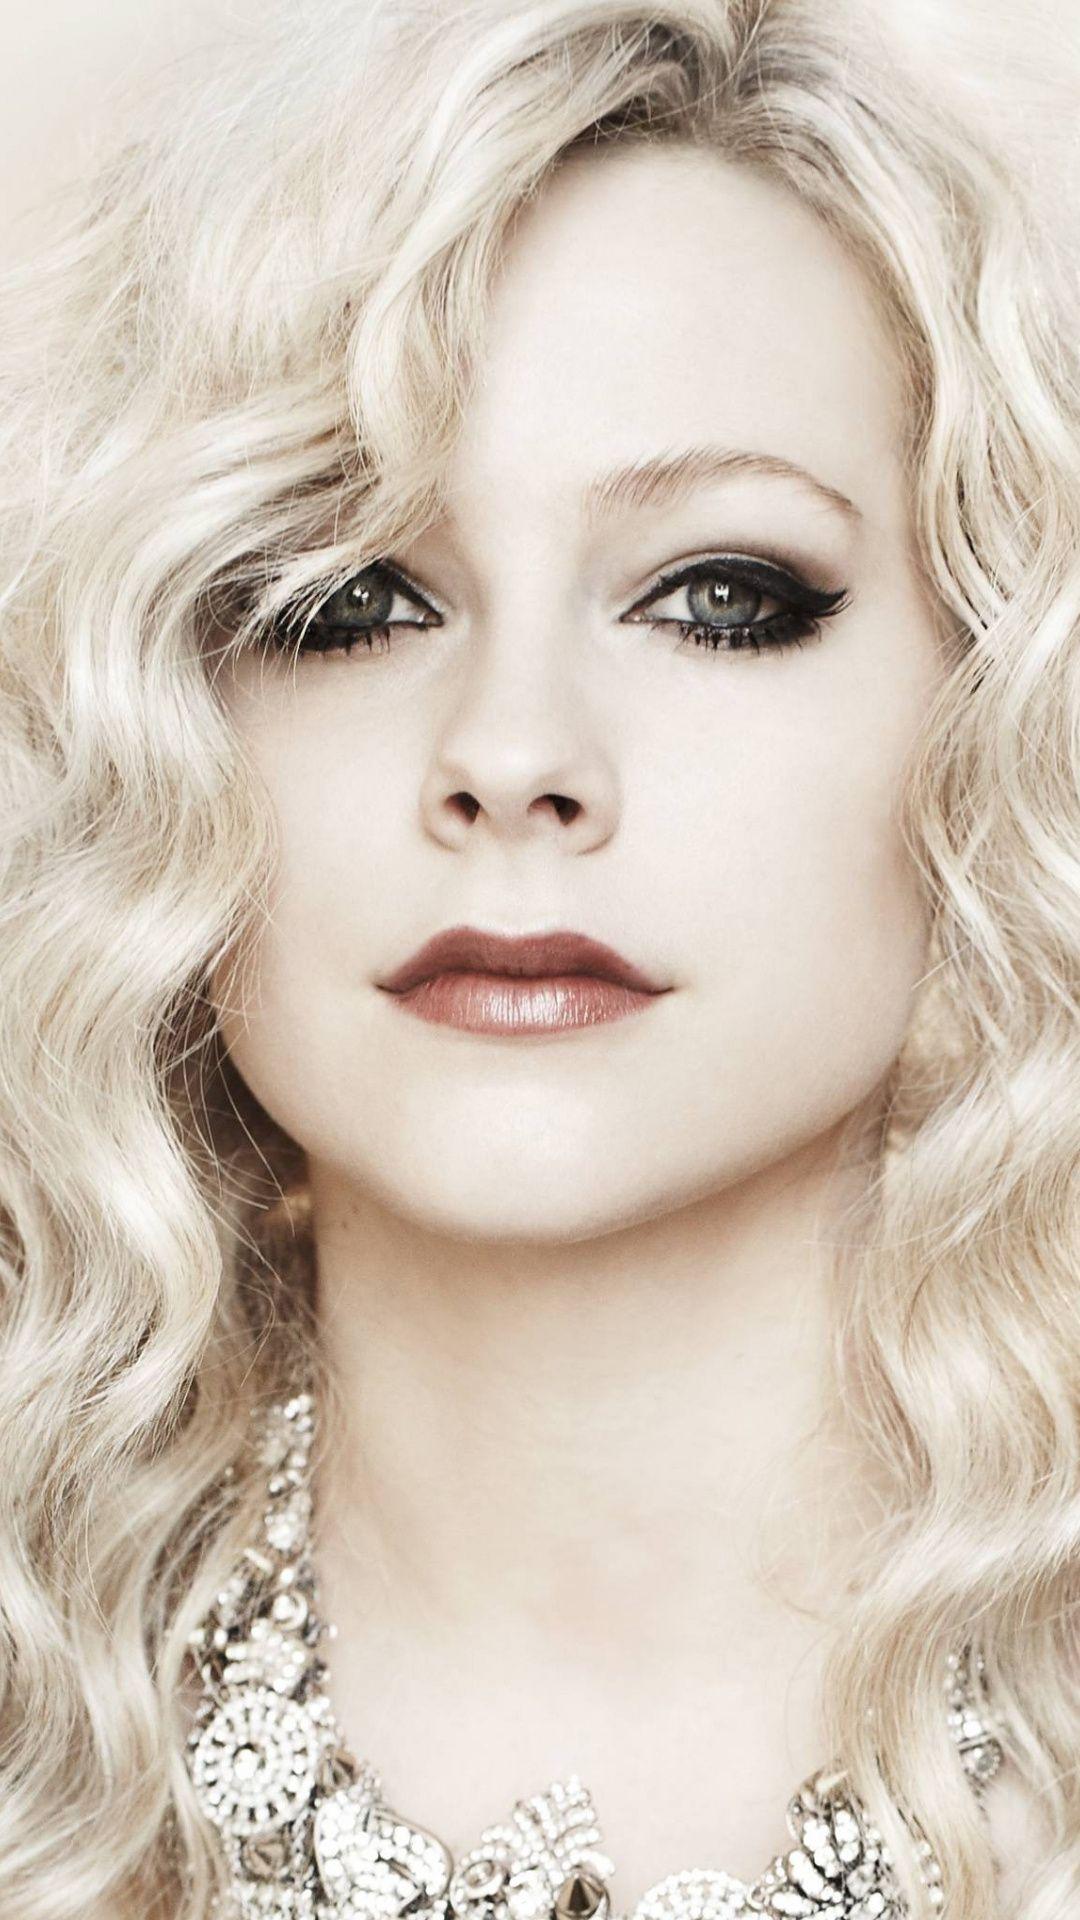 Avril Lavinge Makeup 2018 1080x1920 Wallpaper Celebrity